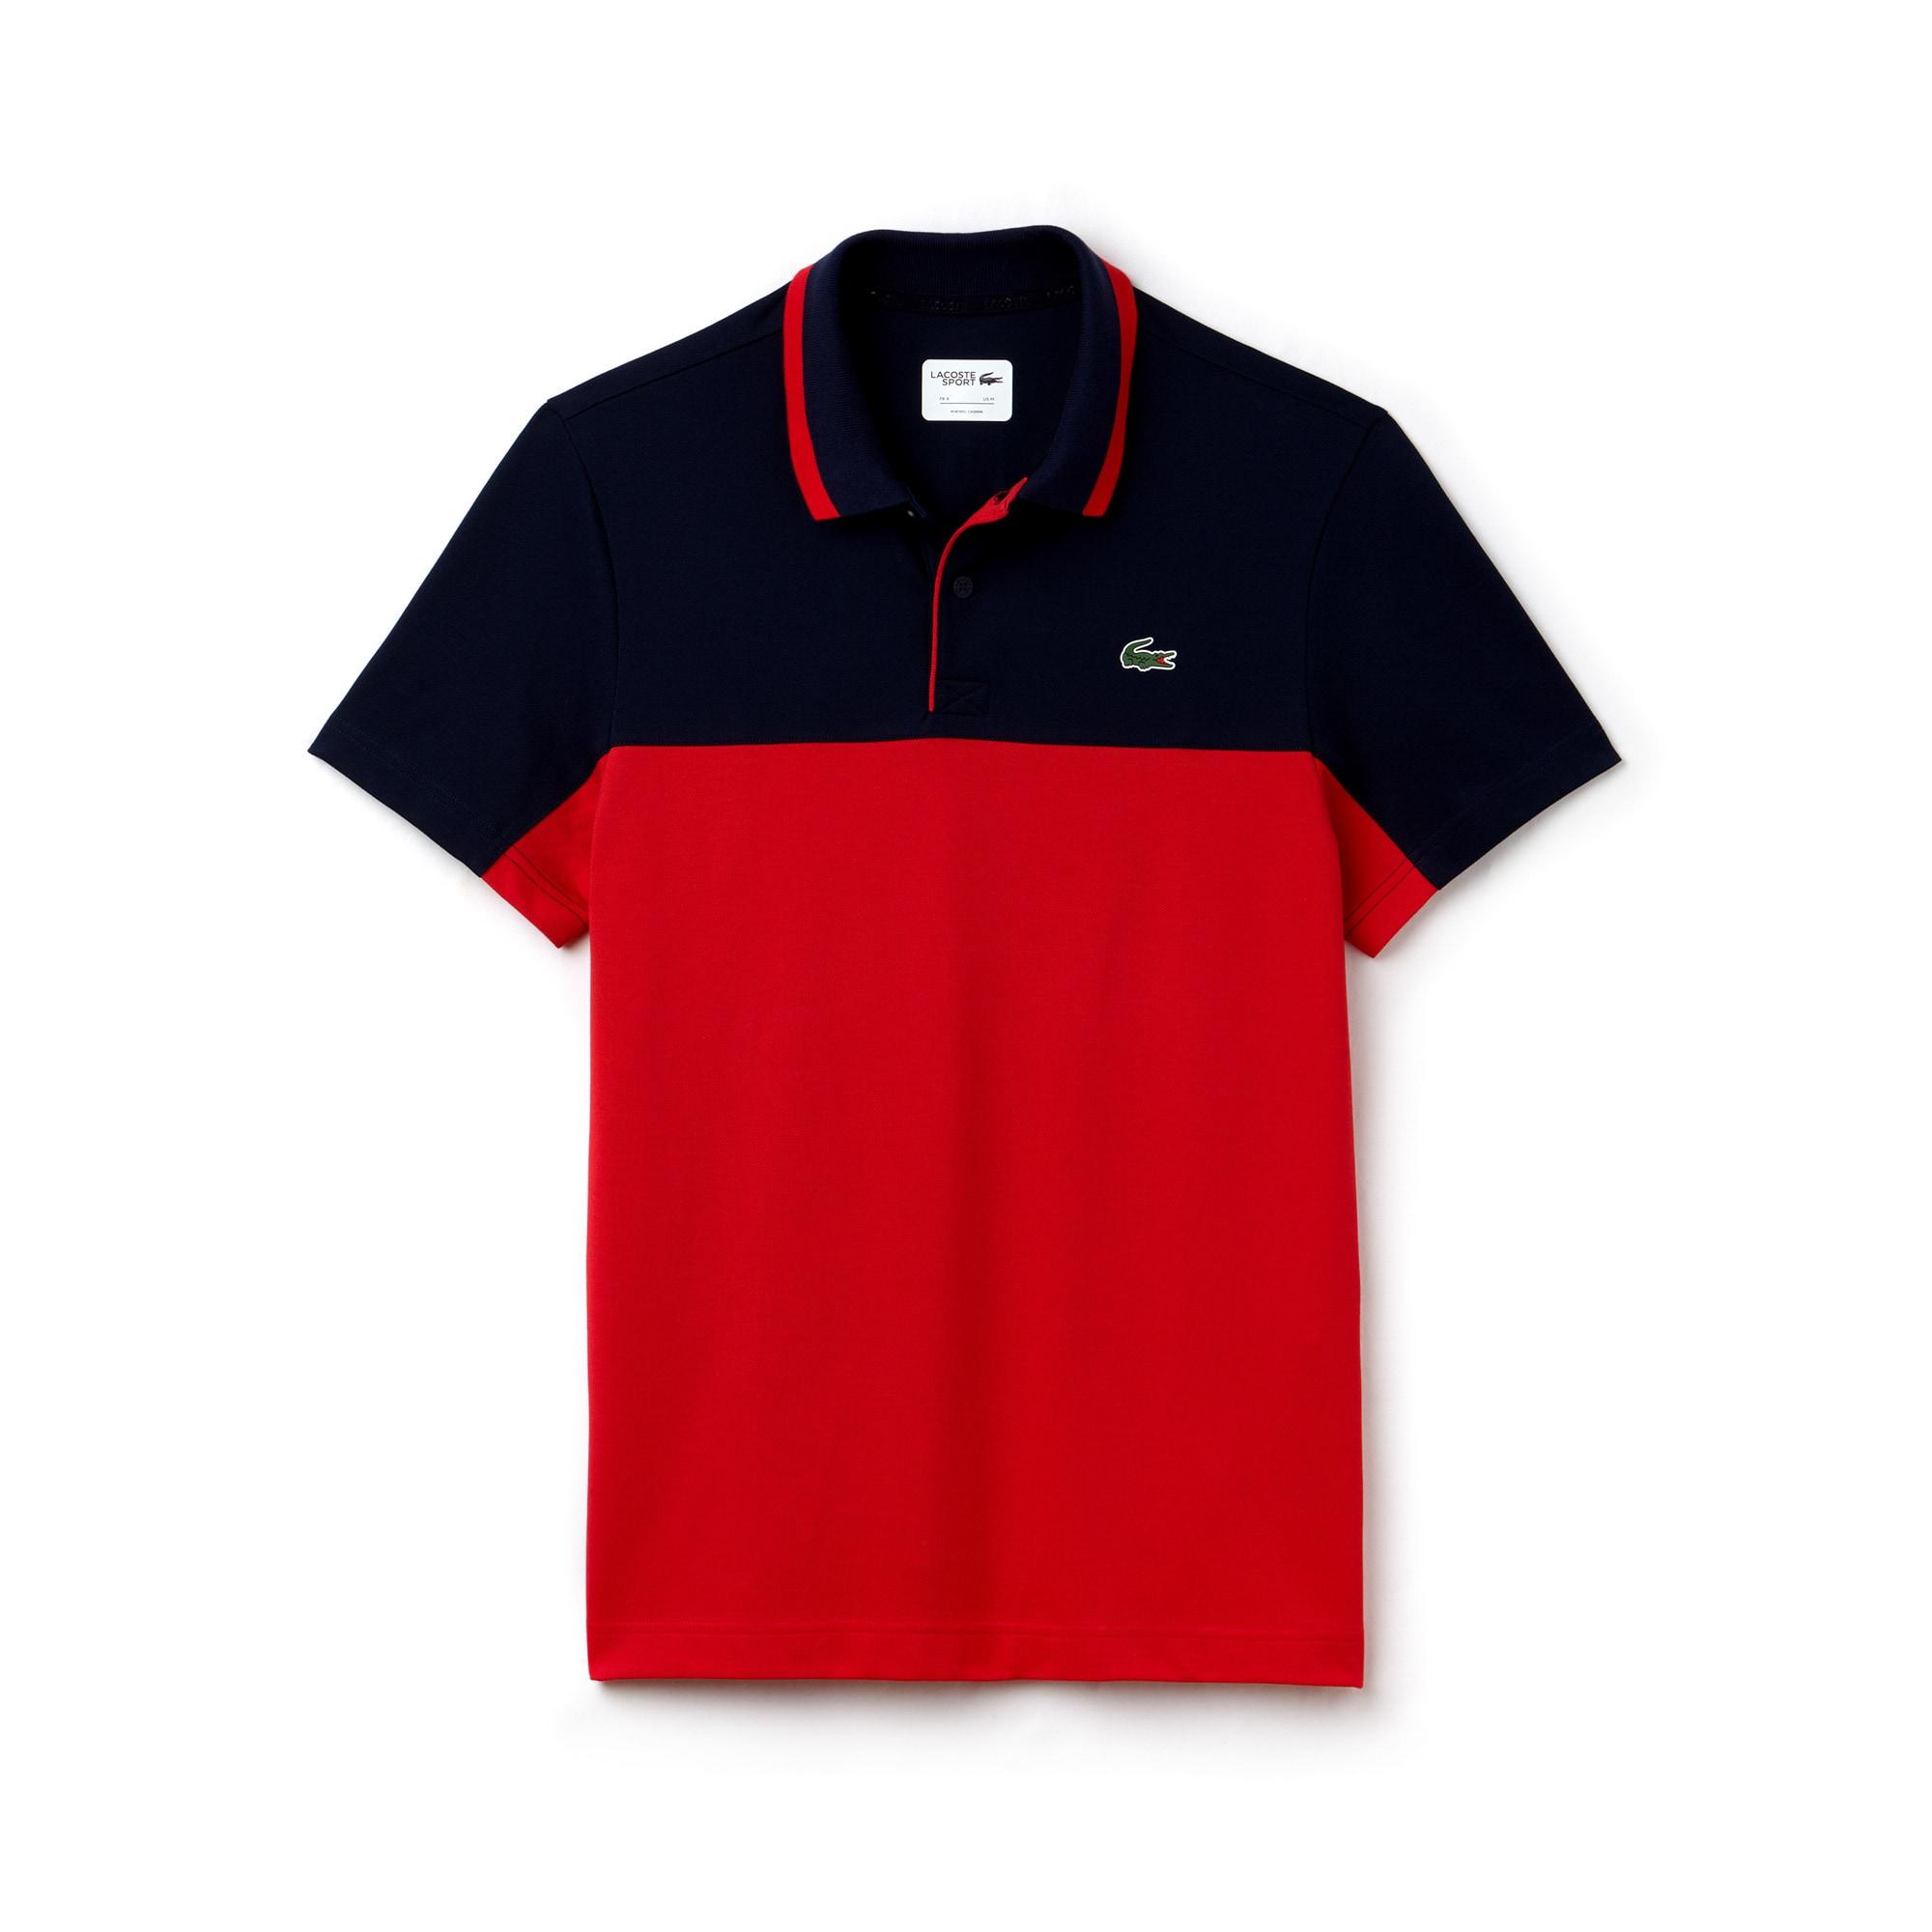 Herren LACOSTE SPORT Golf-Poloshirt mit Colorblocks